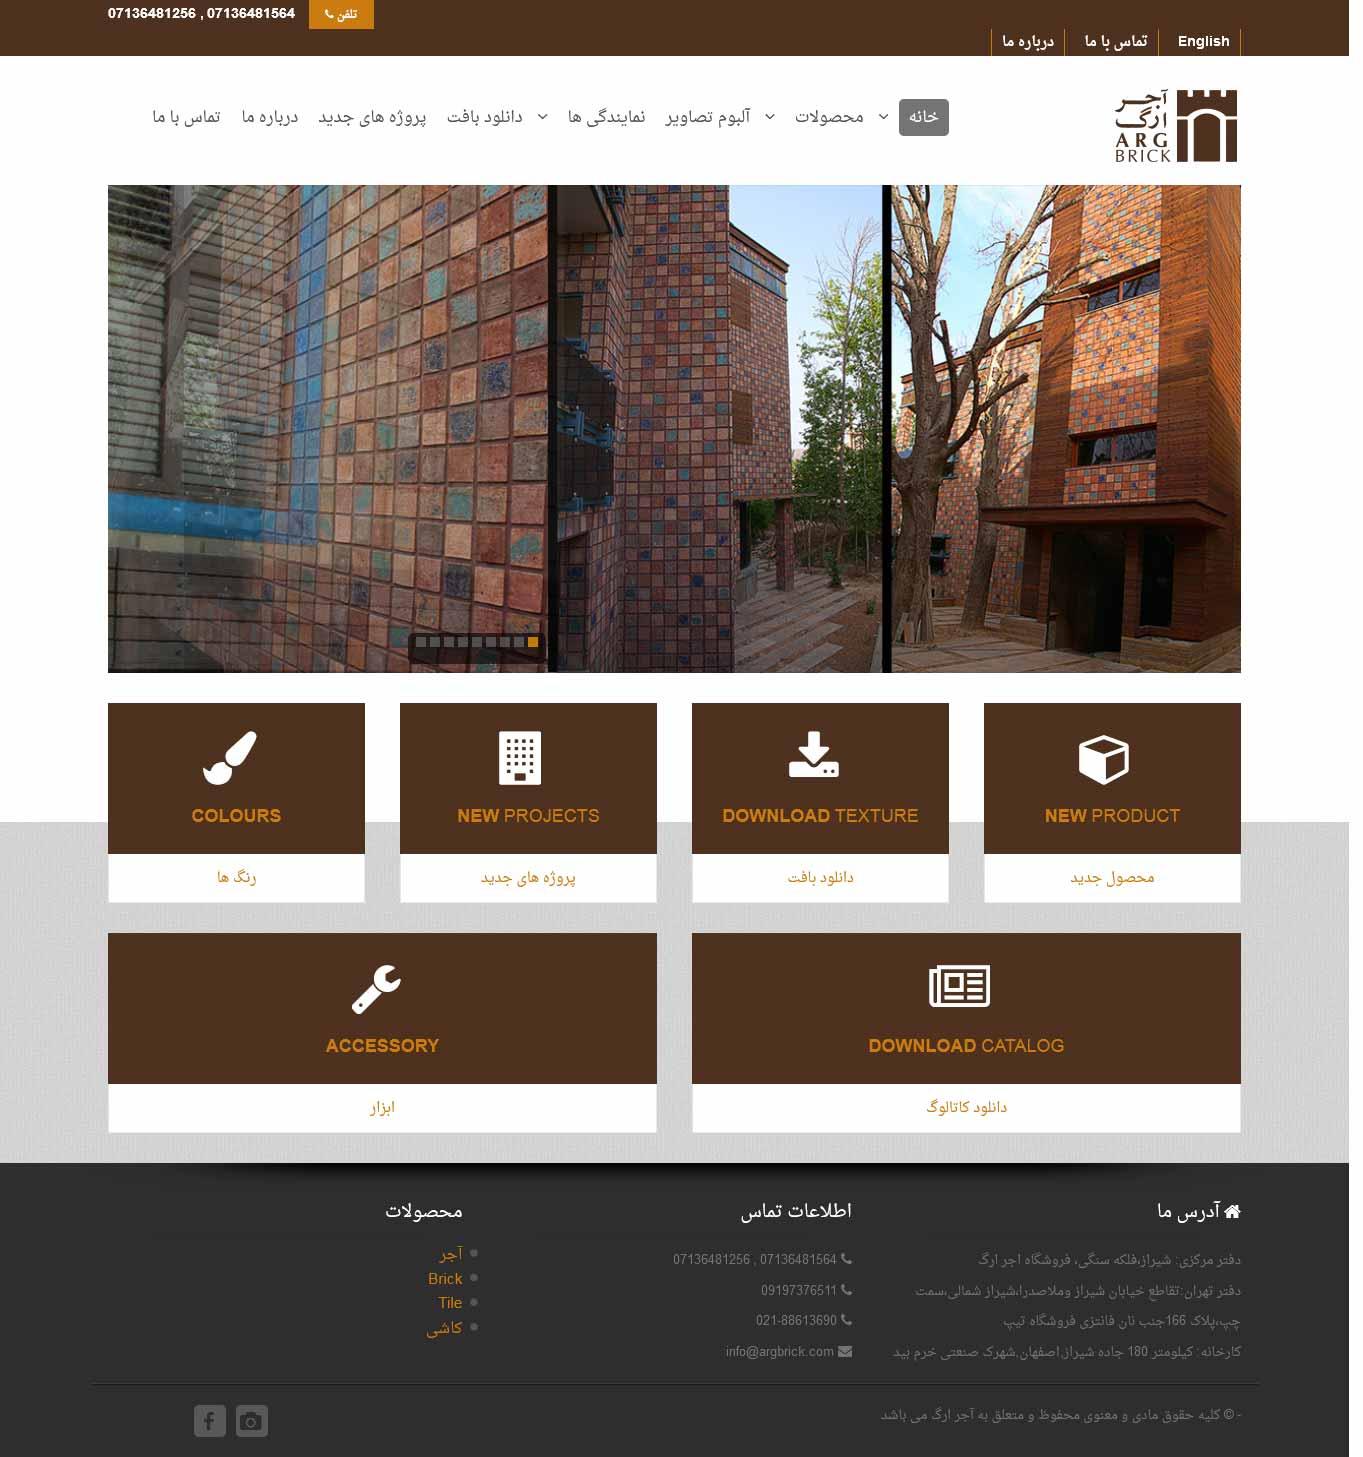 طراحی سایت شرکت آجر ارگ